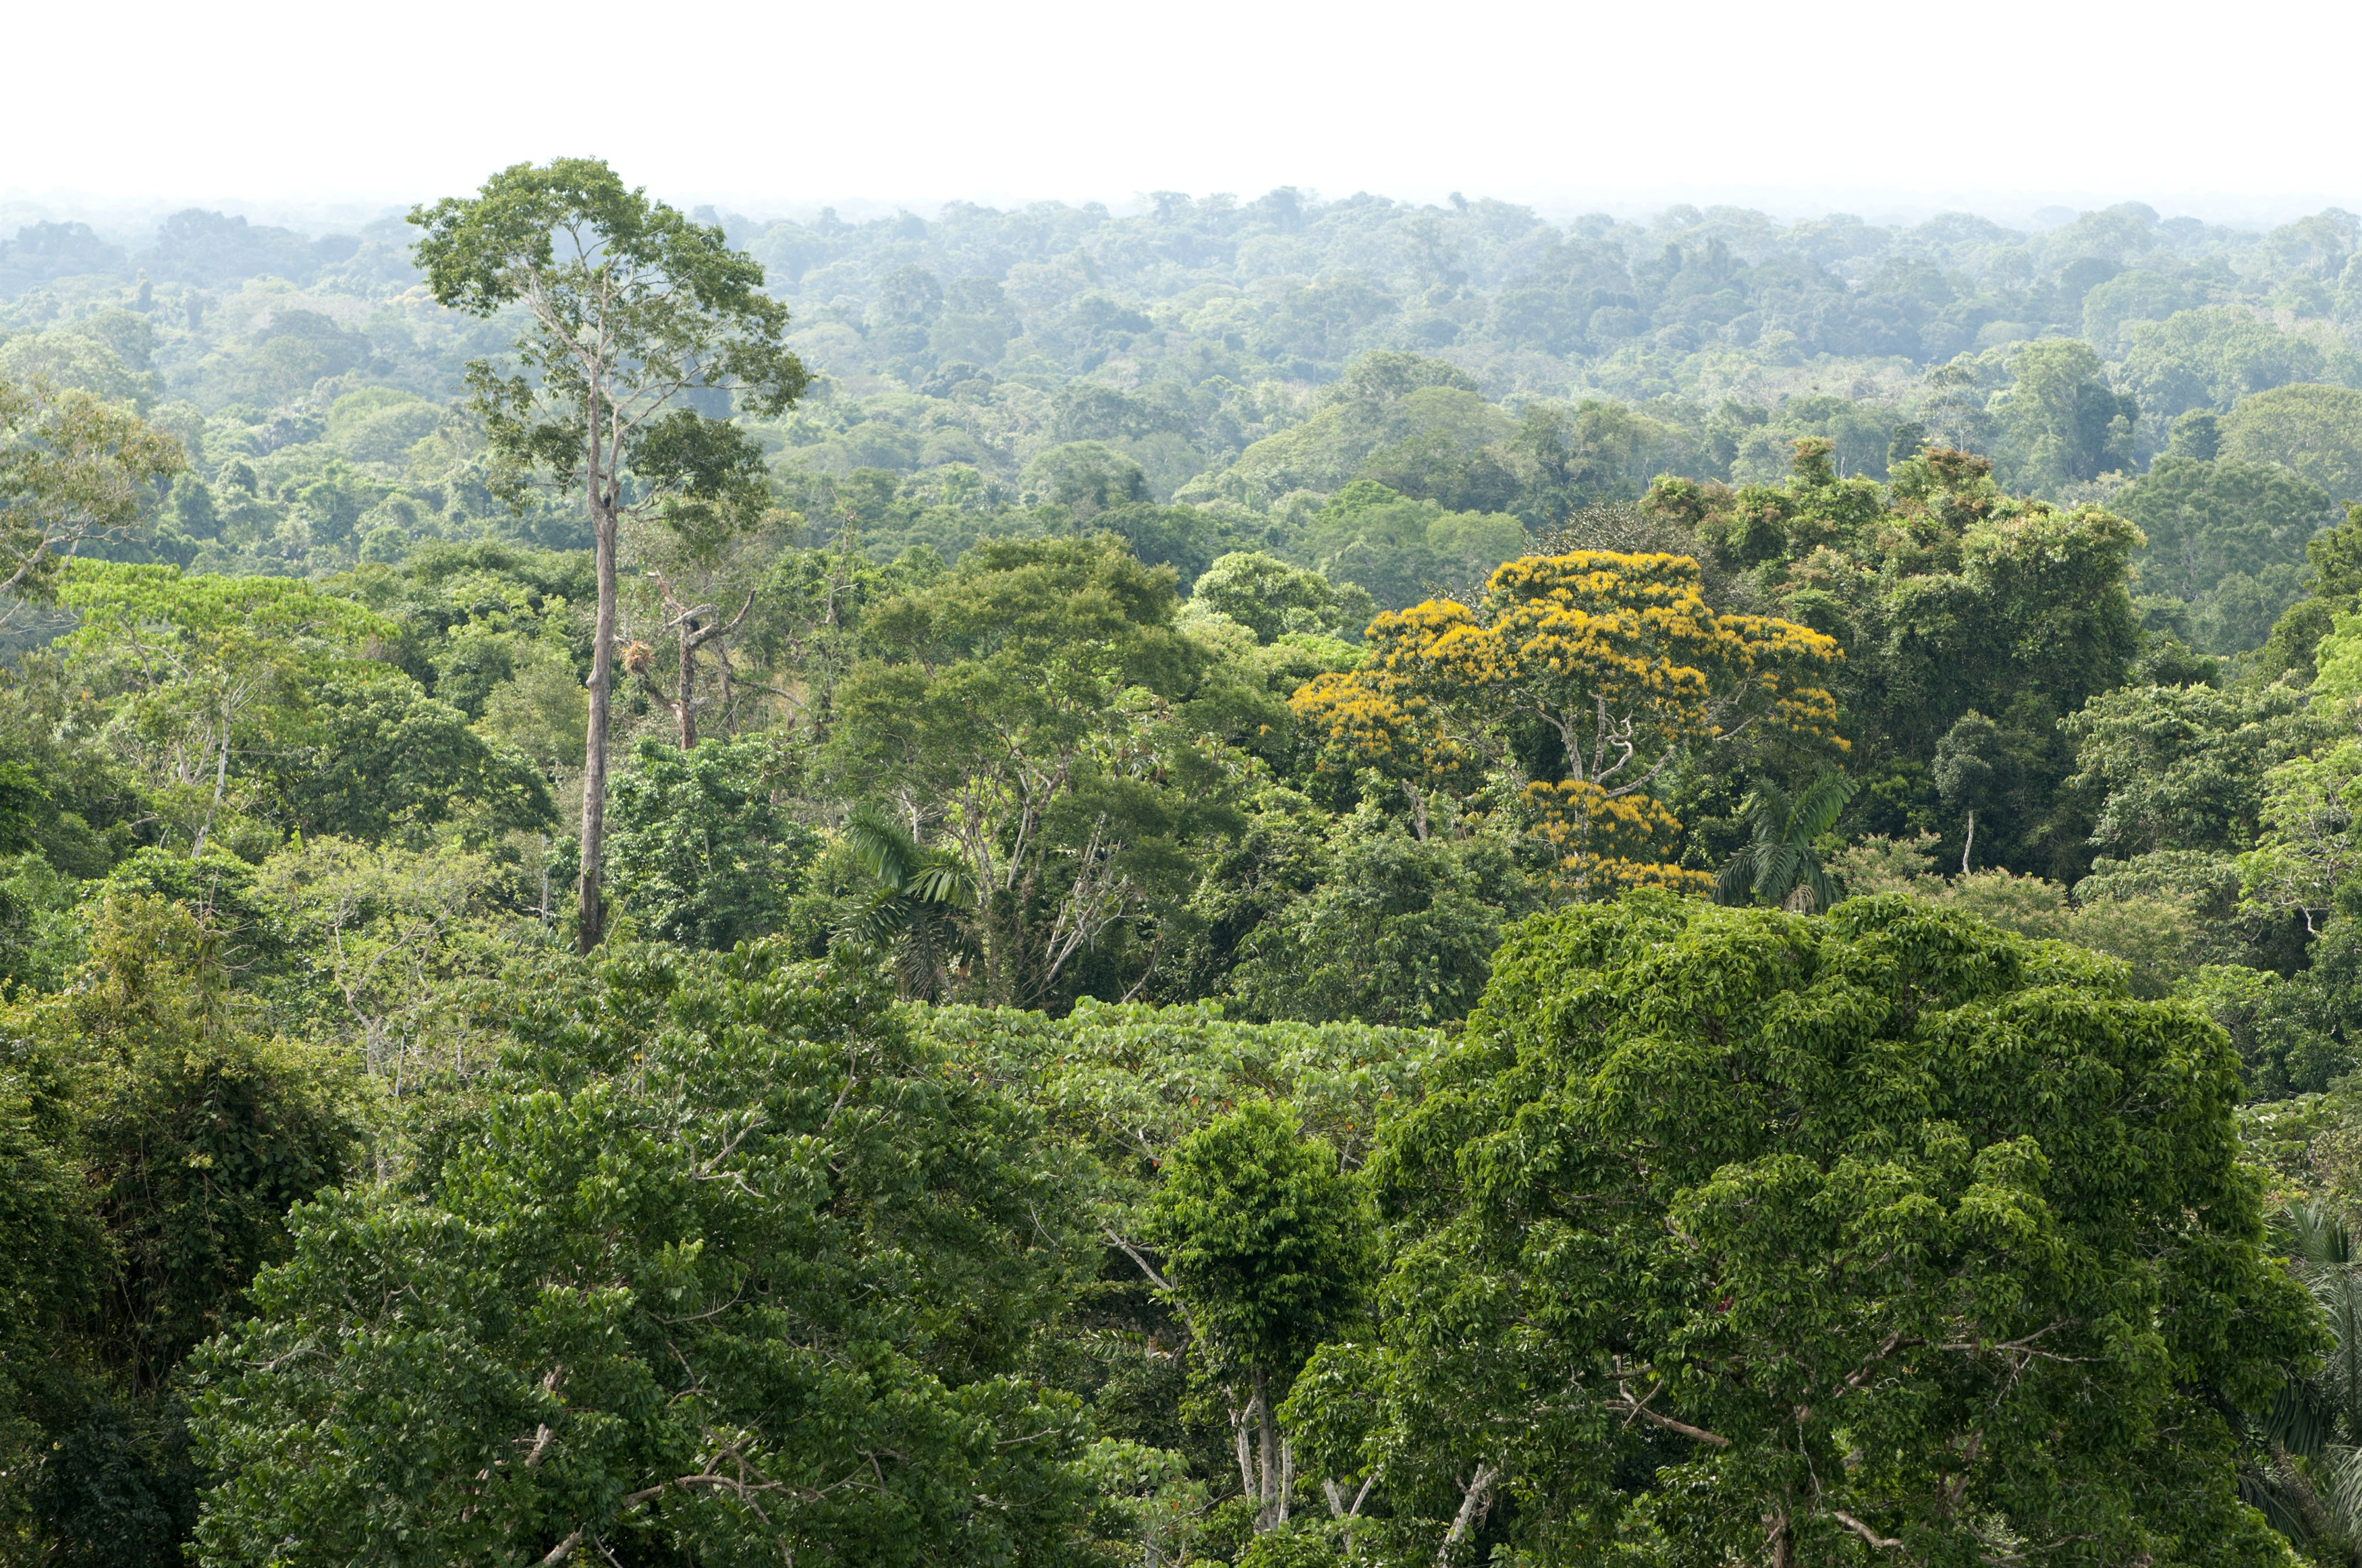 amazone-rainforest-yasuni-national-park-ecuador_75b1-3500x2324px